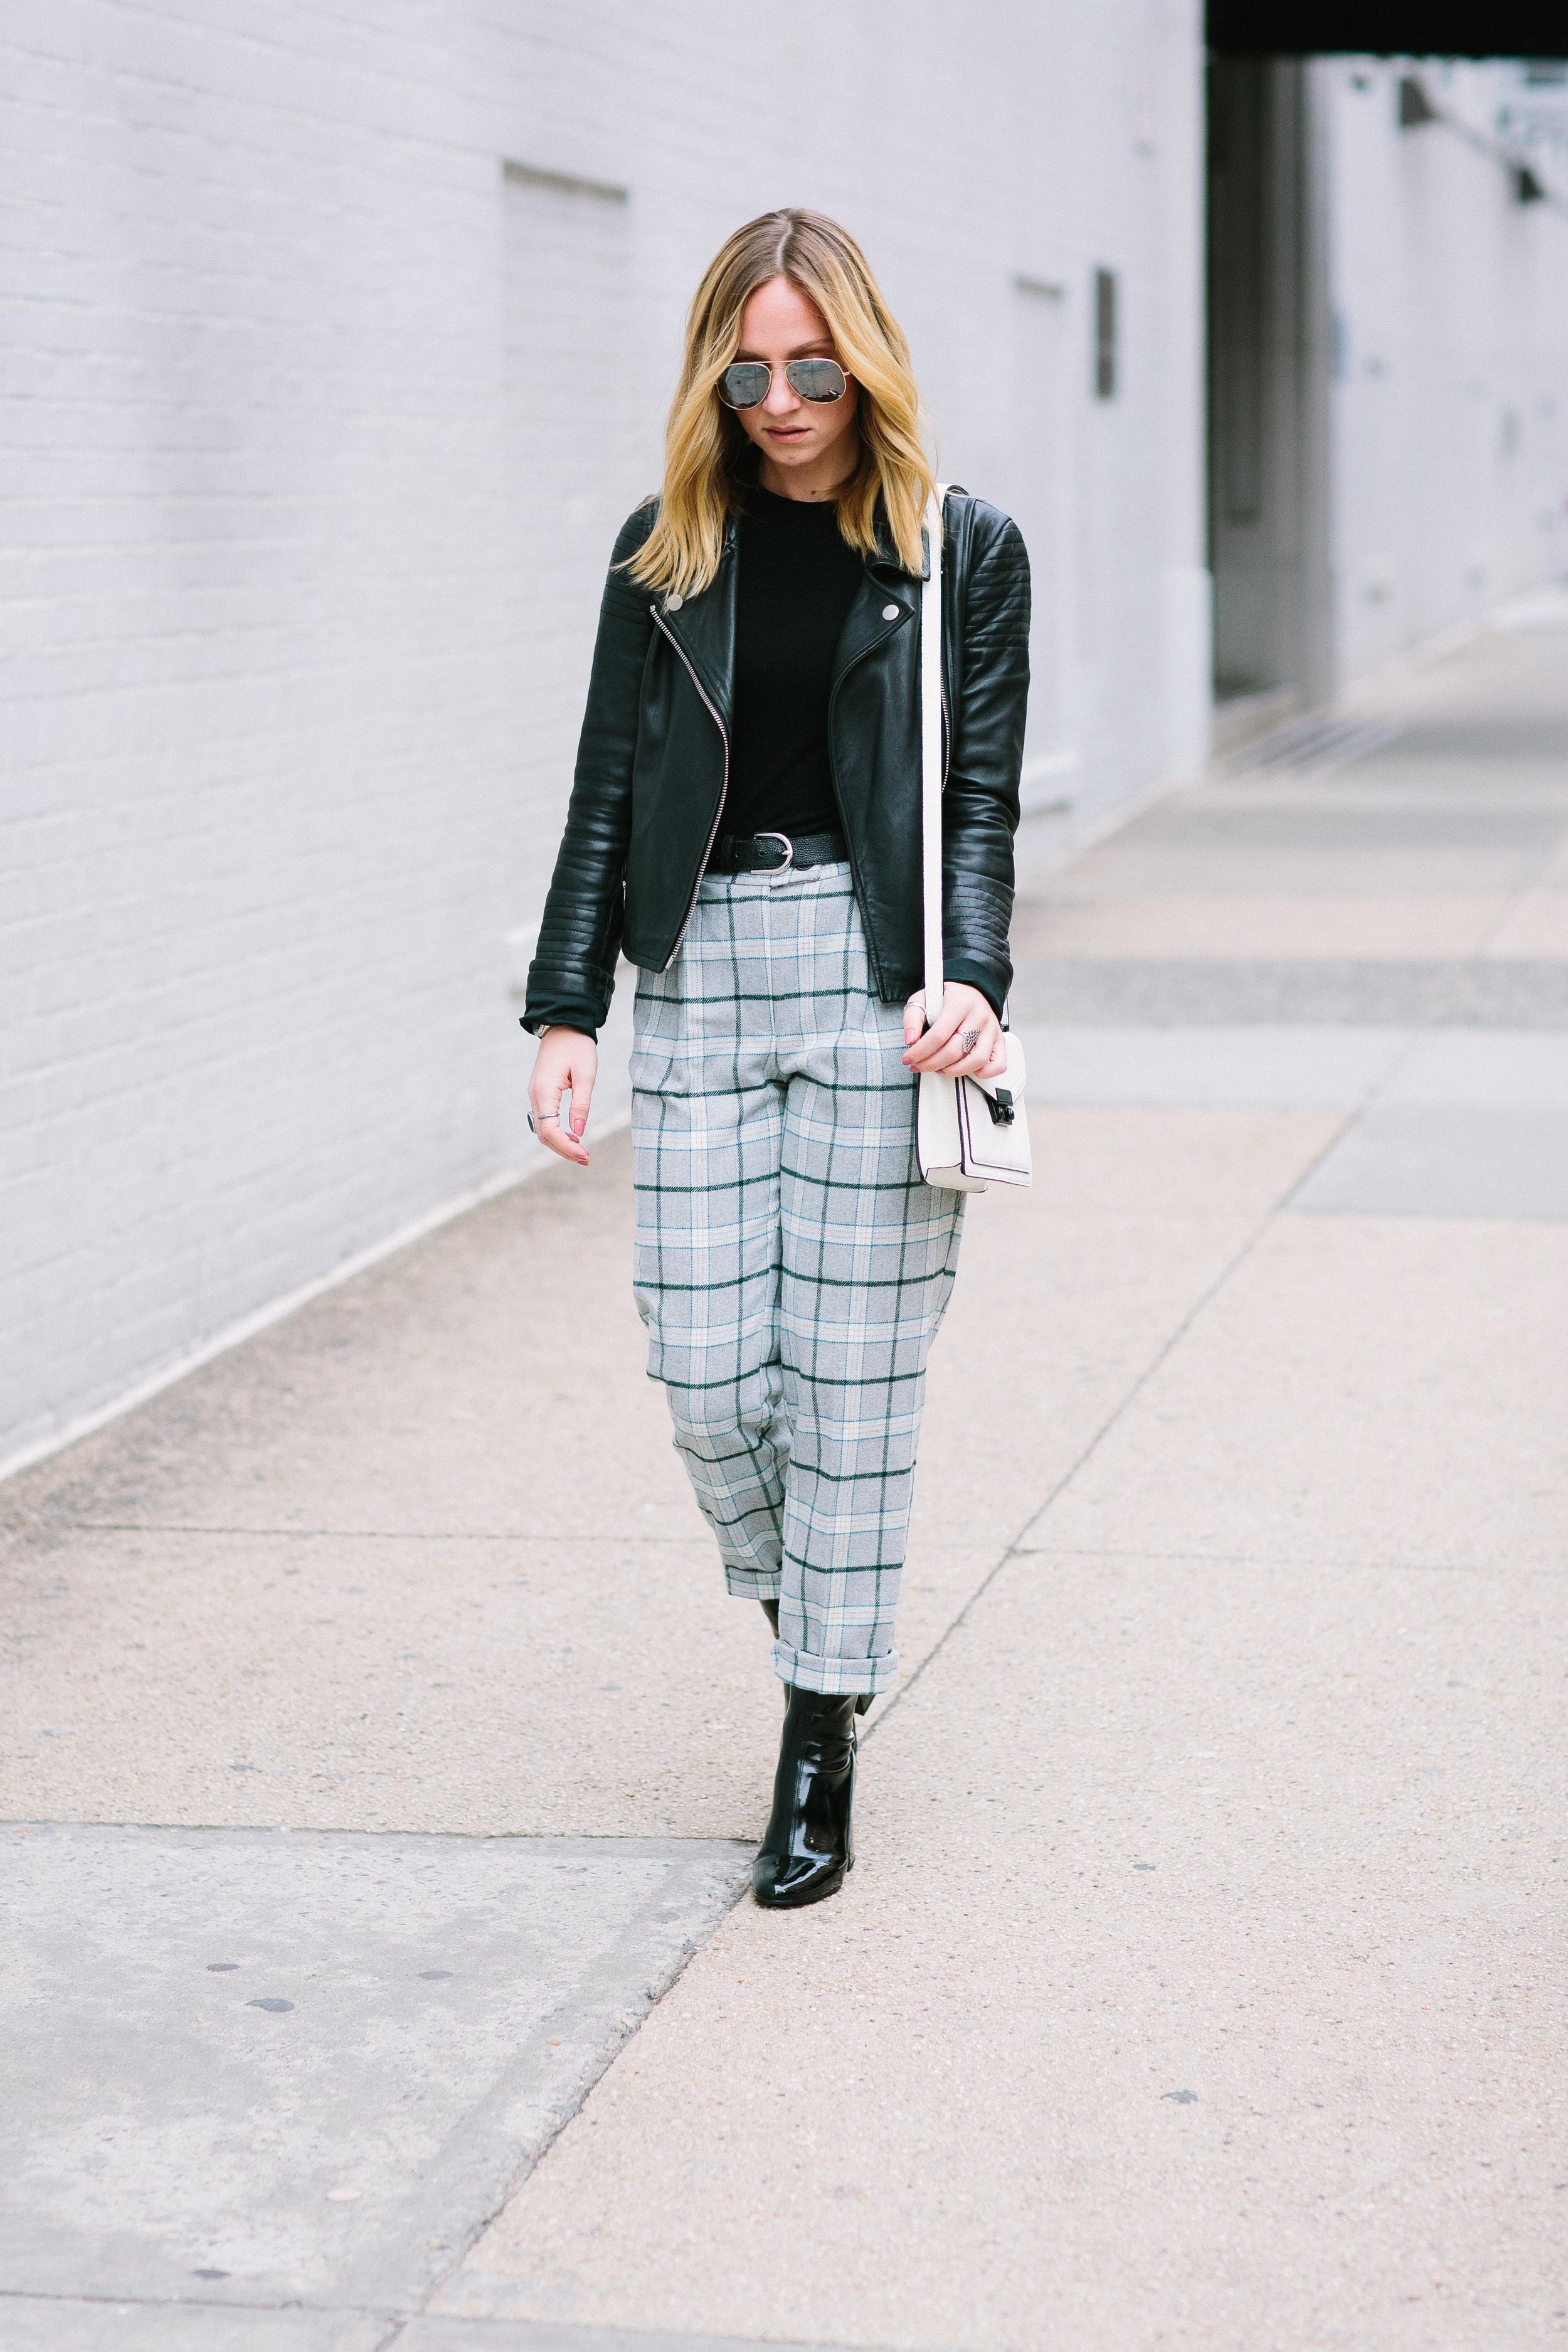 SFW outfit ideas with edge ASOS check boyfriend peg pant